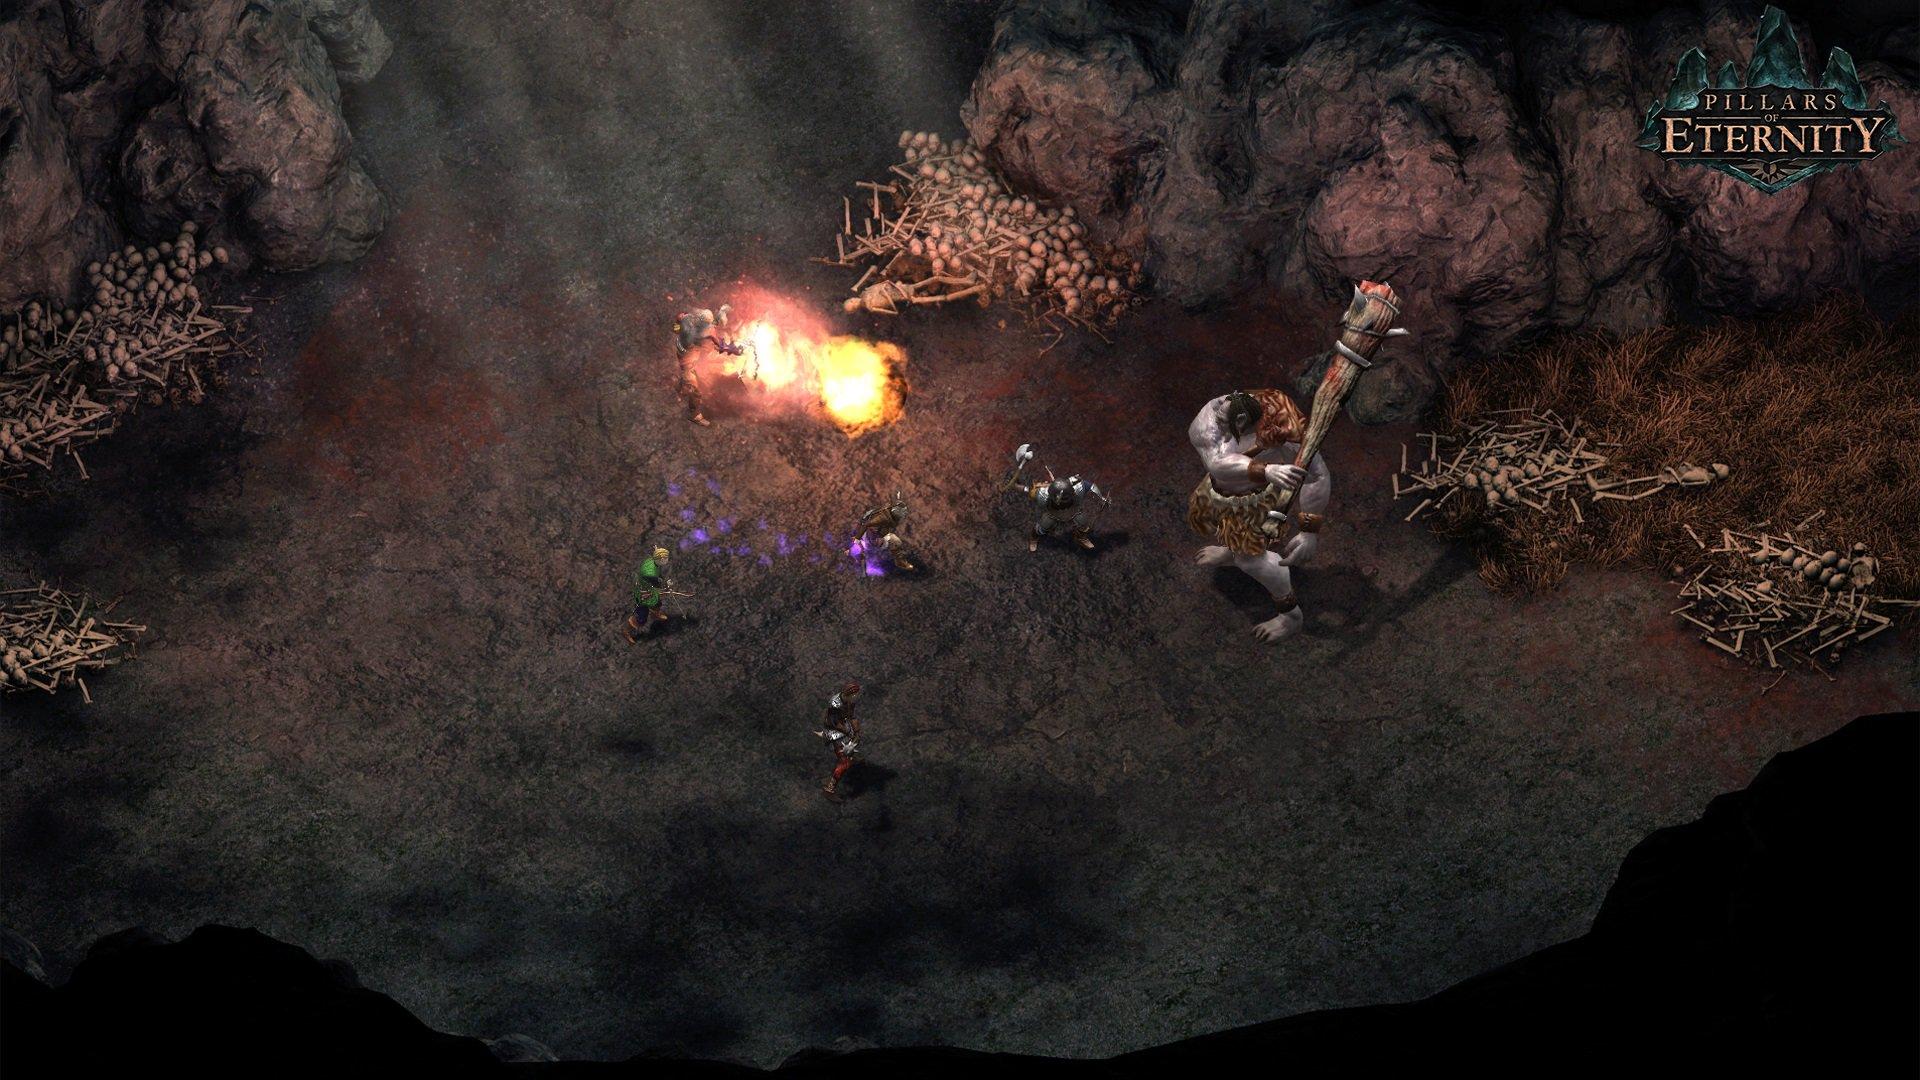 Скриншот к игре Pillars of Eternity: Definitive Edition [v 3.7.0.1280] (2015) PC | RePack от R.G. Механики